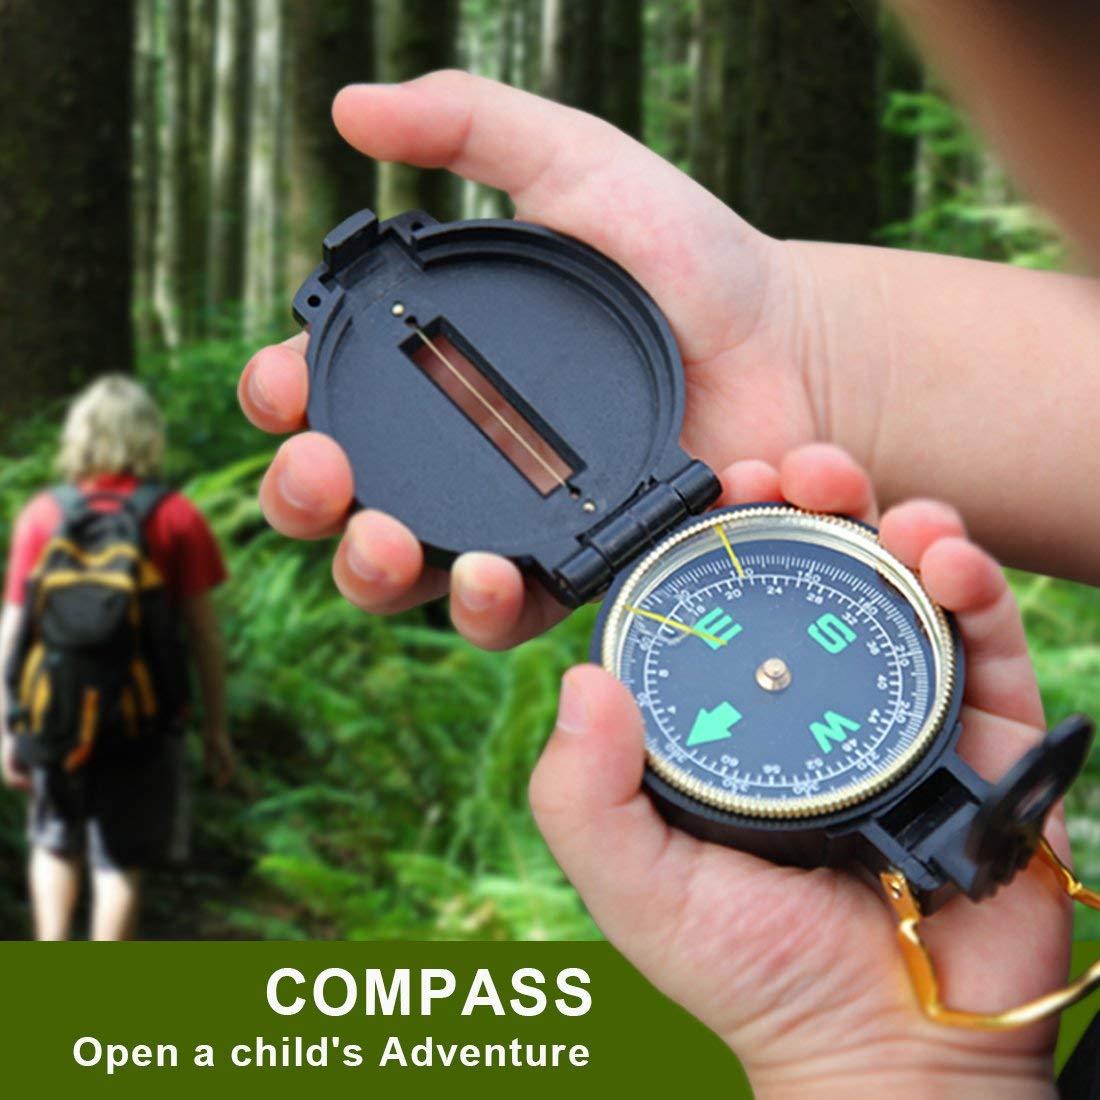 Kids Binoculars Toy Set Compass,Magnifying Glass,Best Gifts For Birthday Educational Outdoor Explorer Kit for Kids Kids Adventure Kit- Outdoor Exploration Kit Camping,Toys Binocular,Flashlight